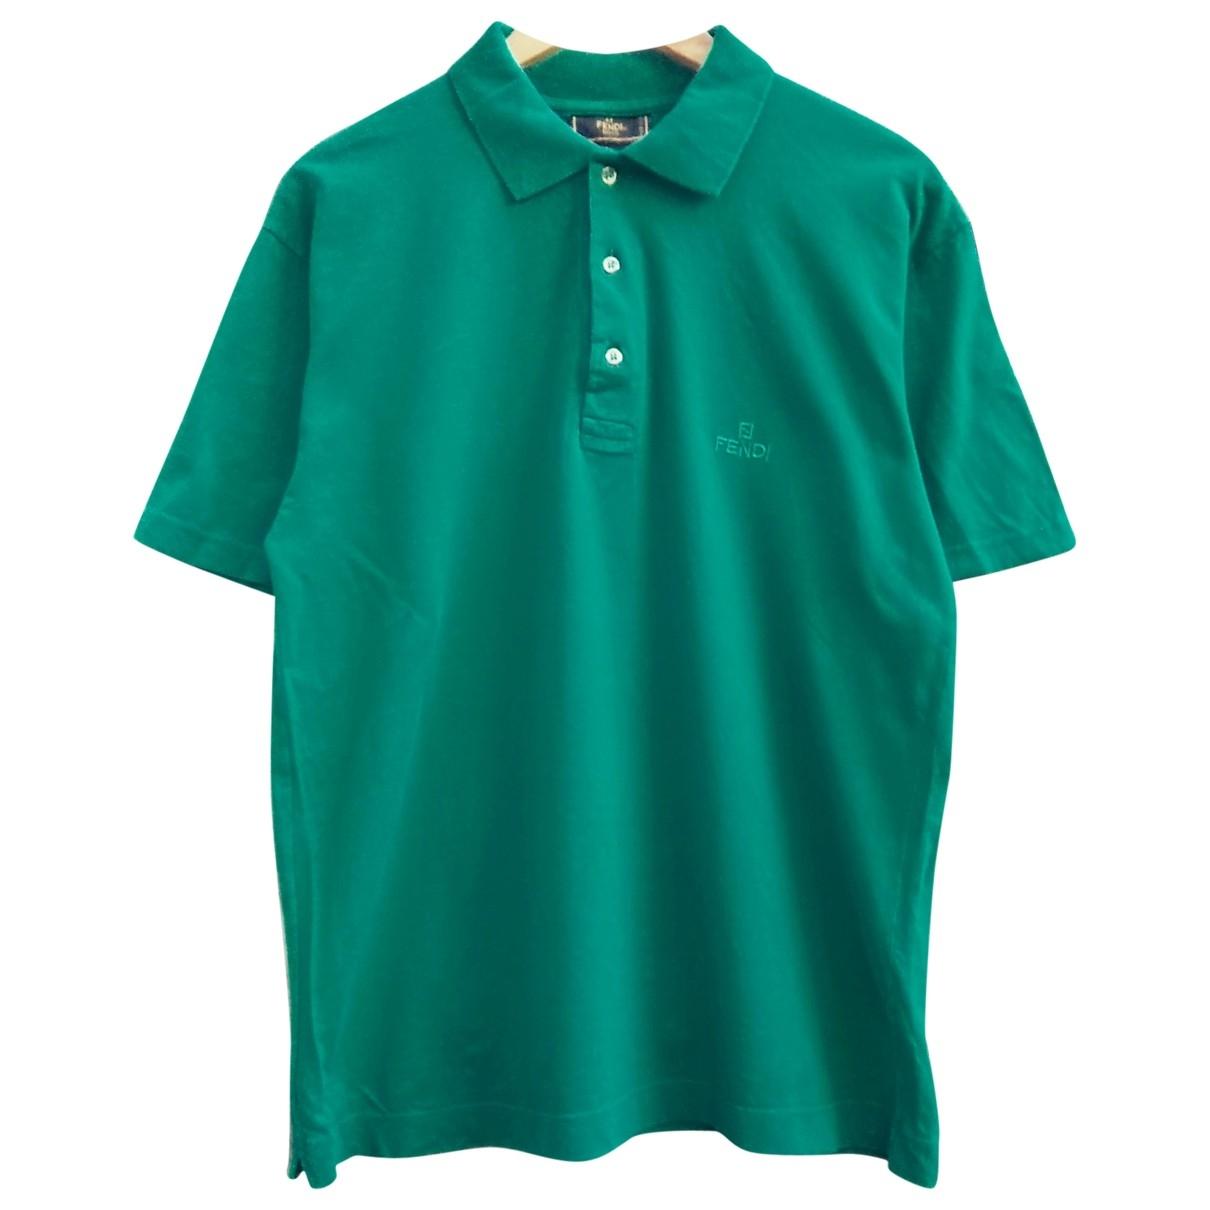 Fendi \N Poloshirts in  Gruen Baumwolle